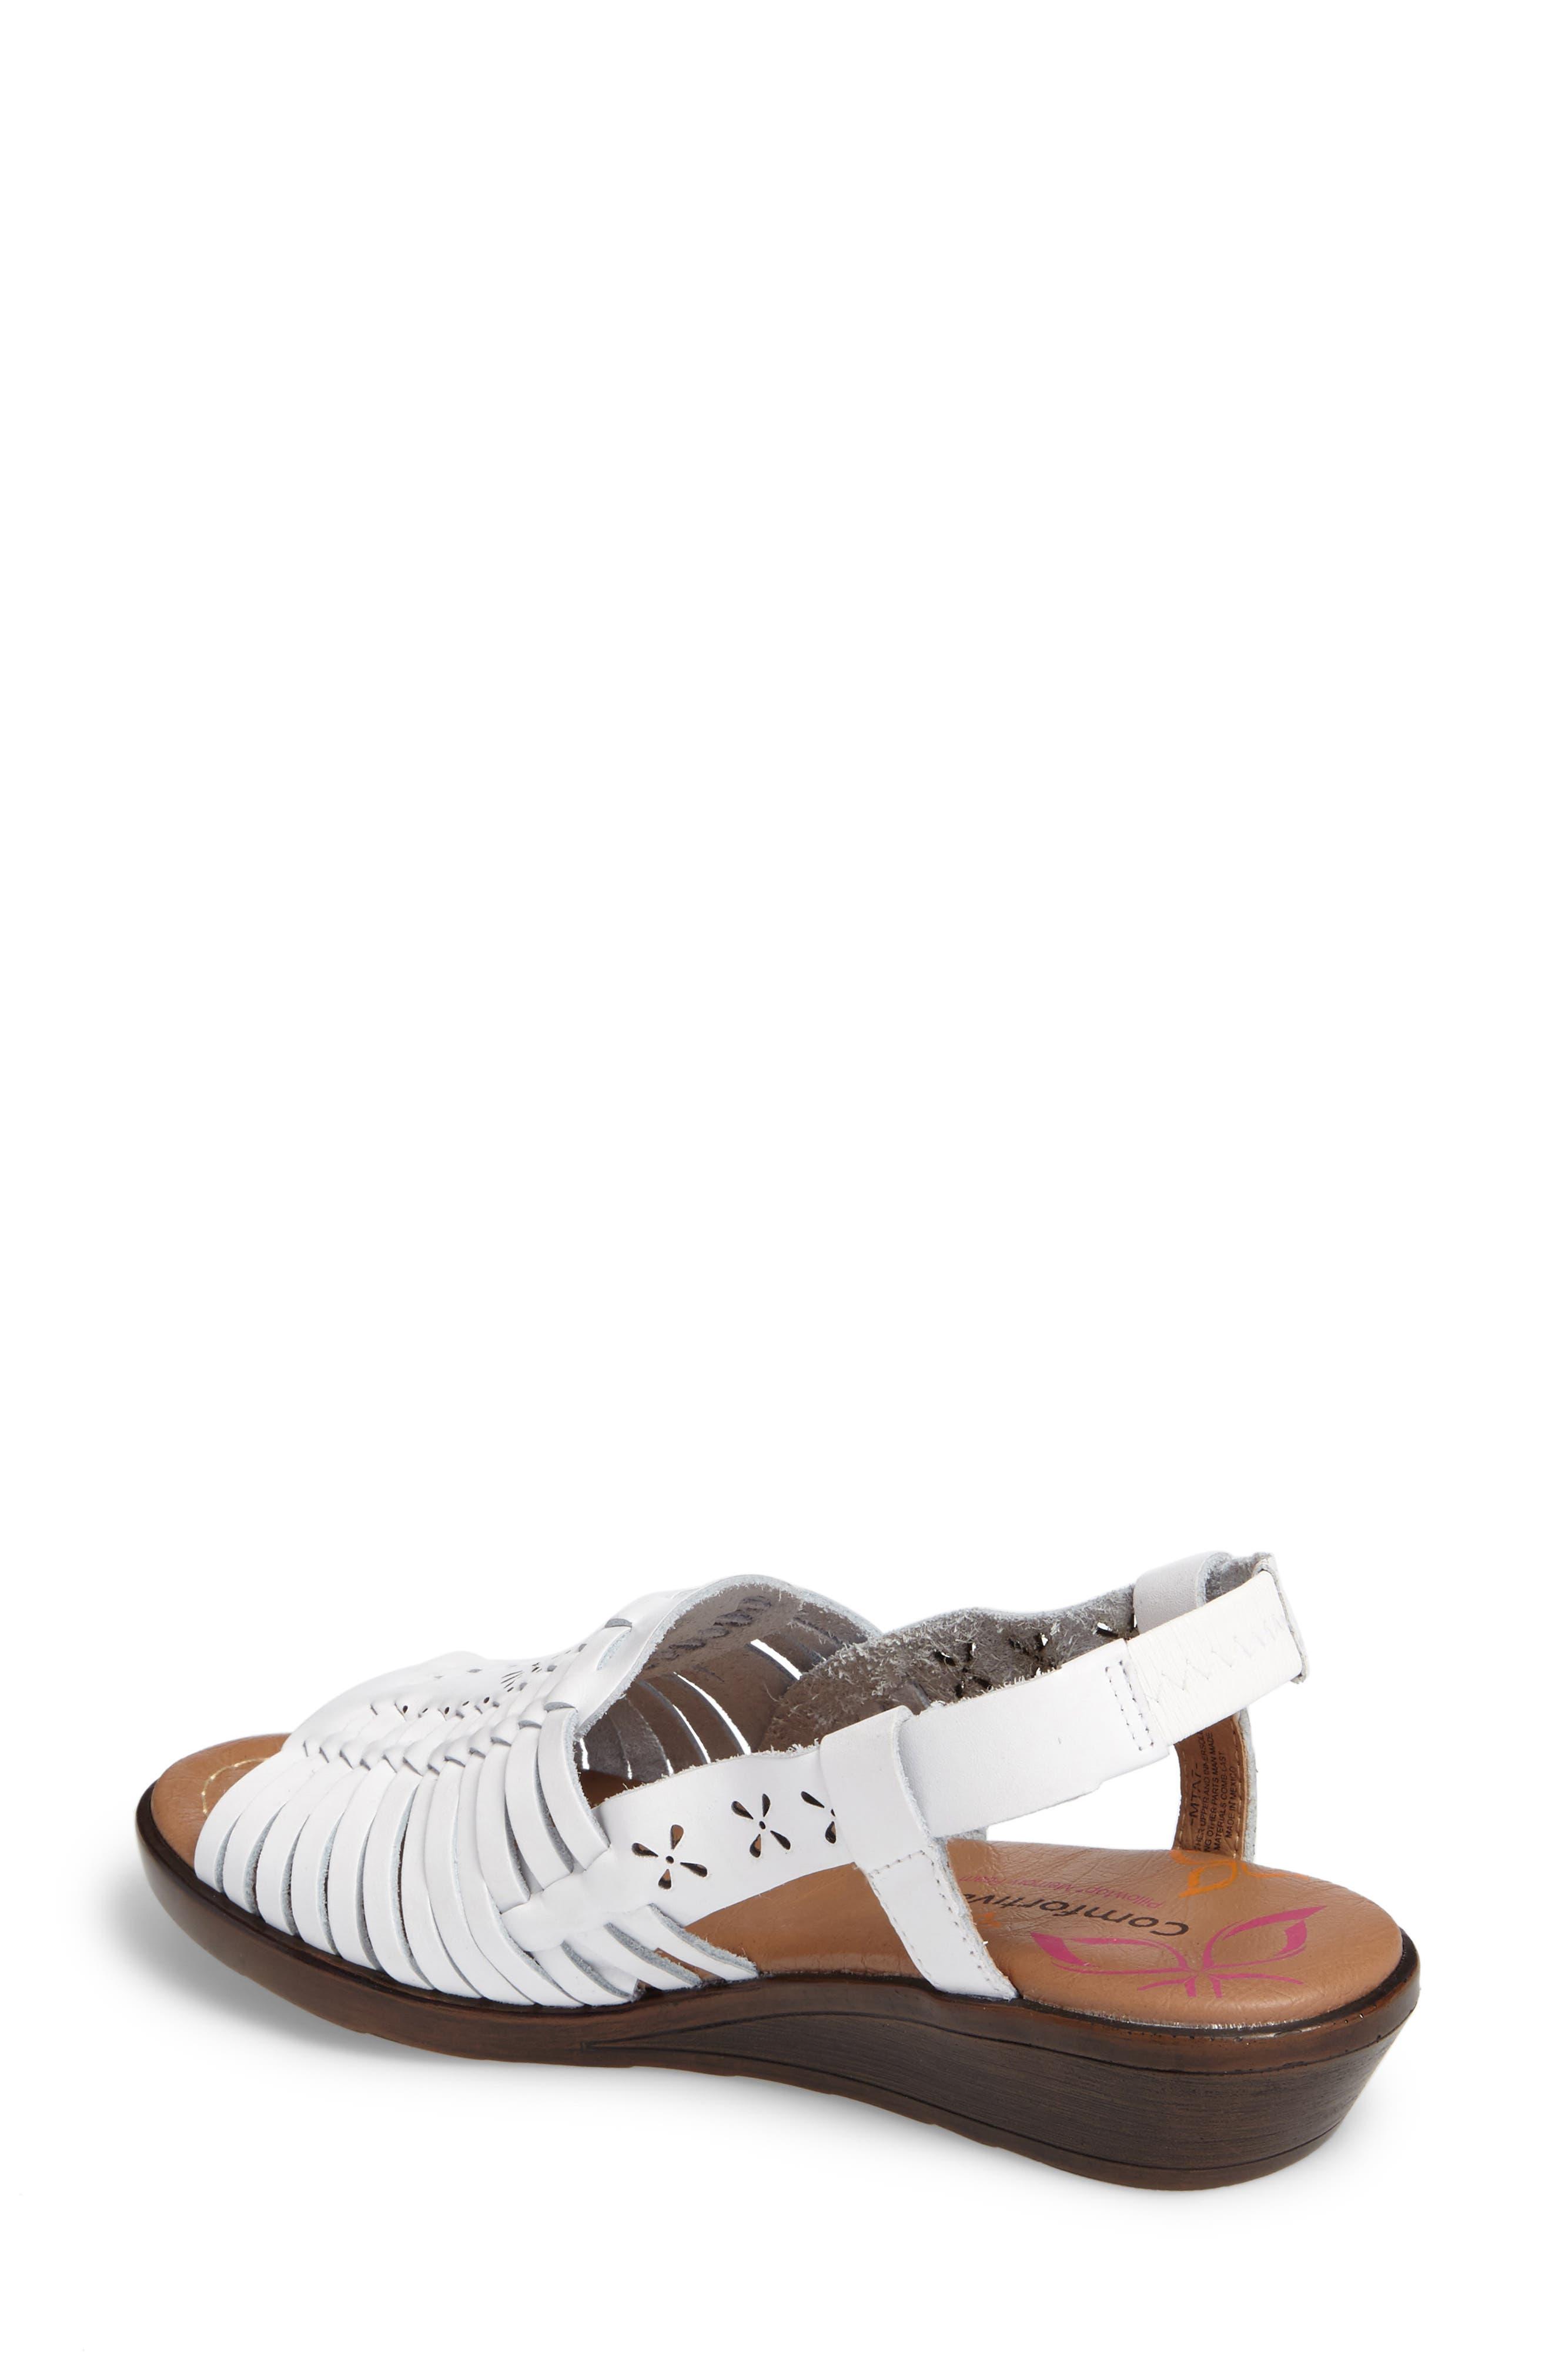 Alternate Image 2  - Comfortiva Formasa Huarache Slingback Sandal (Women)